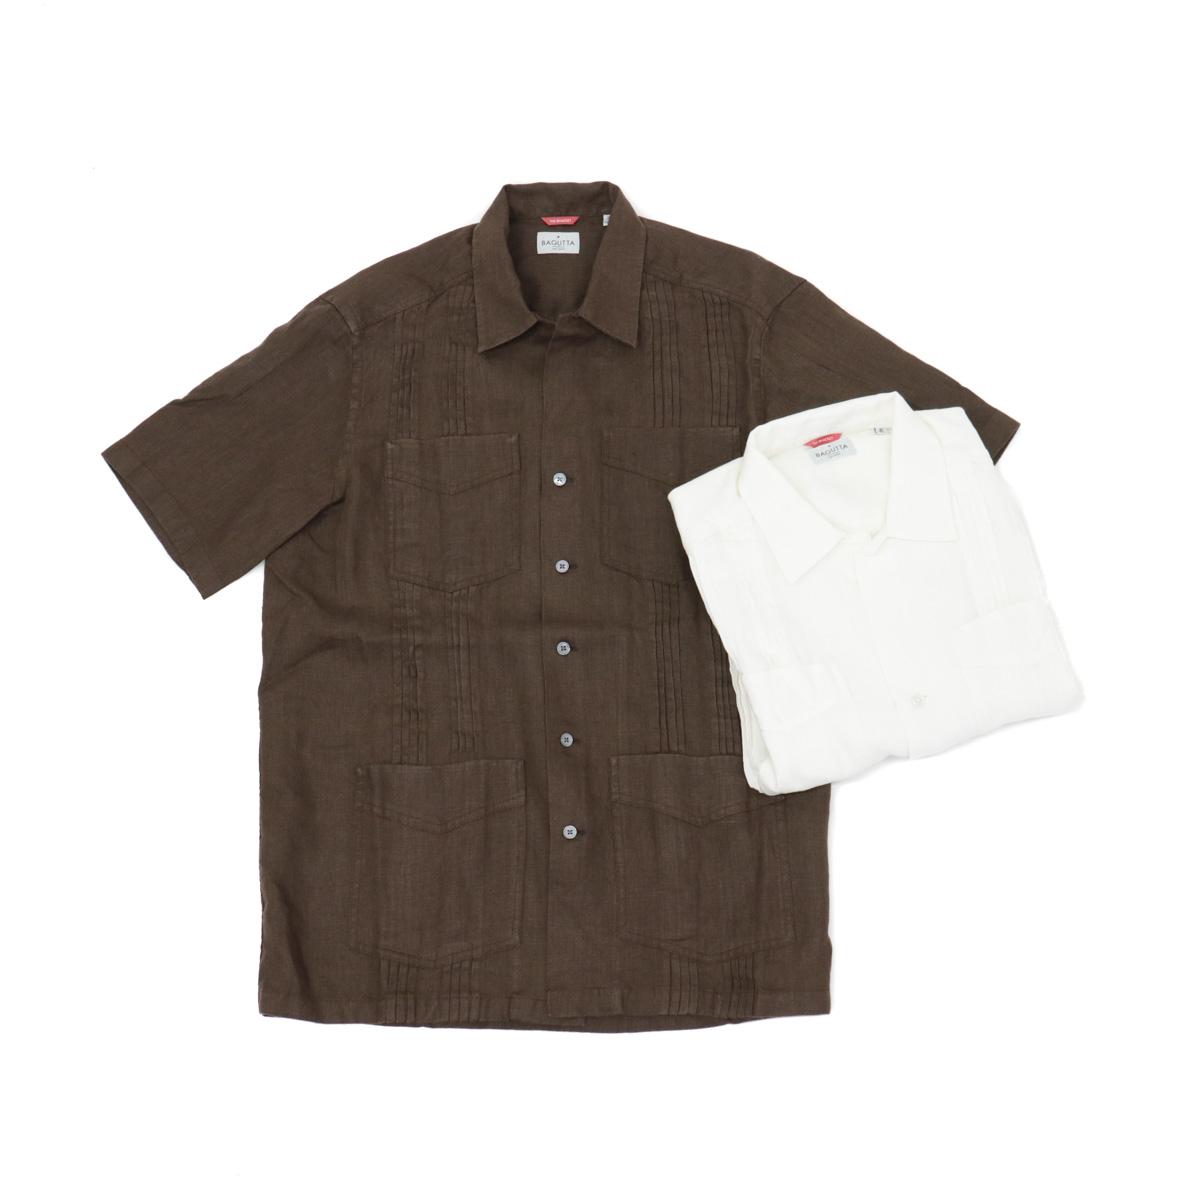 BAGUTTA バグッタキューバシャツ[ブラウン・ホワイト]